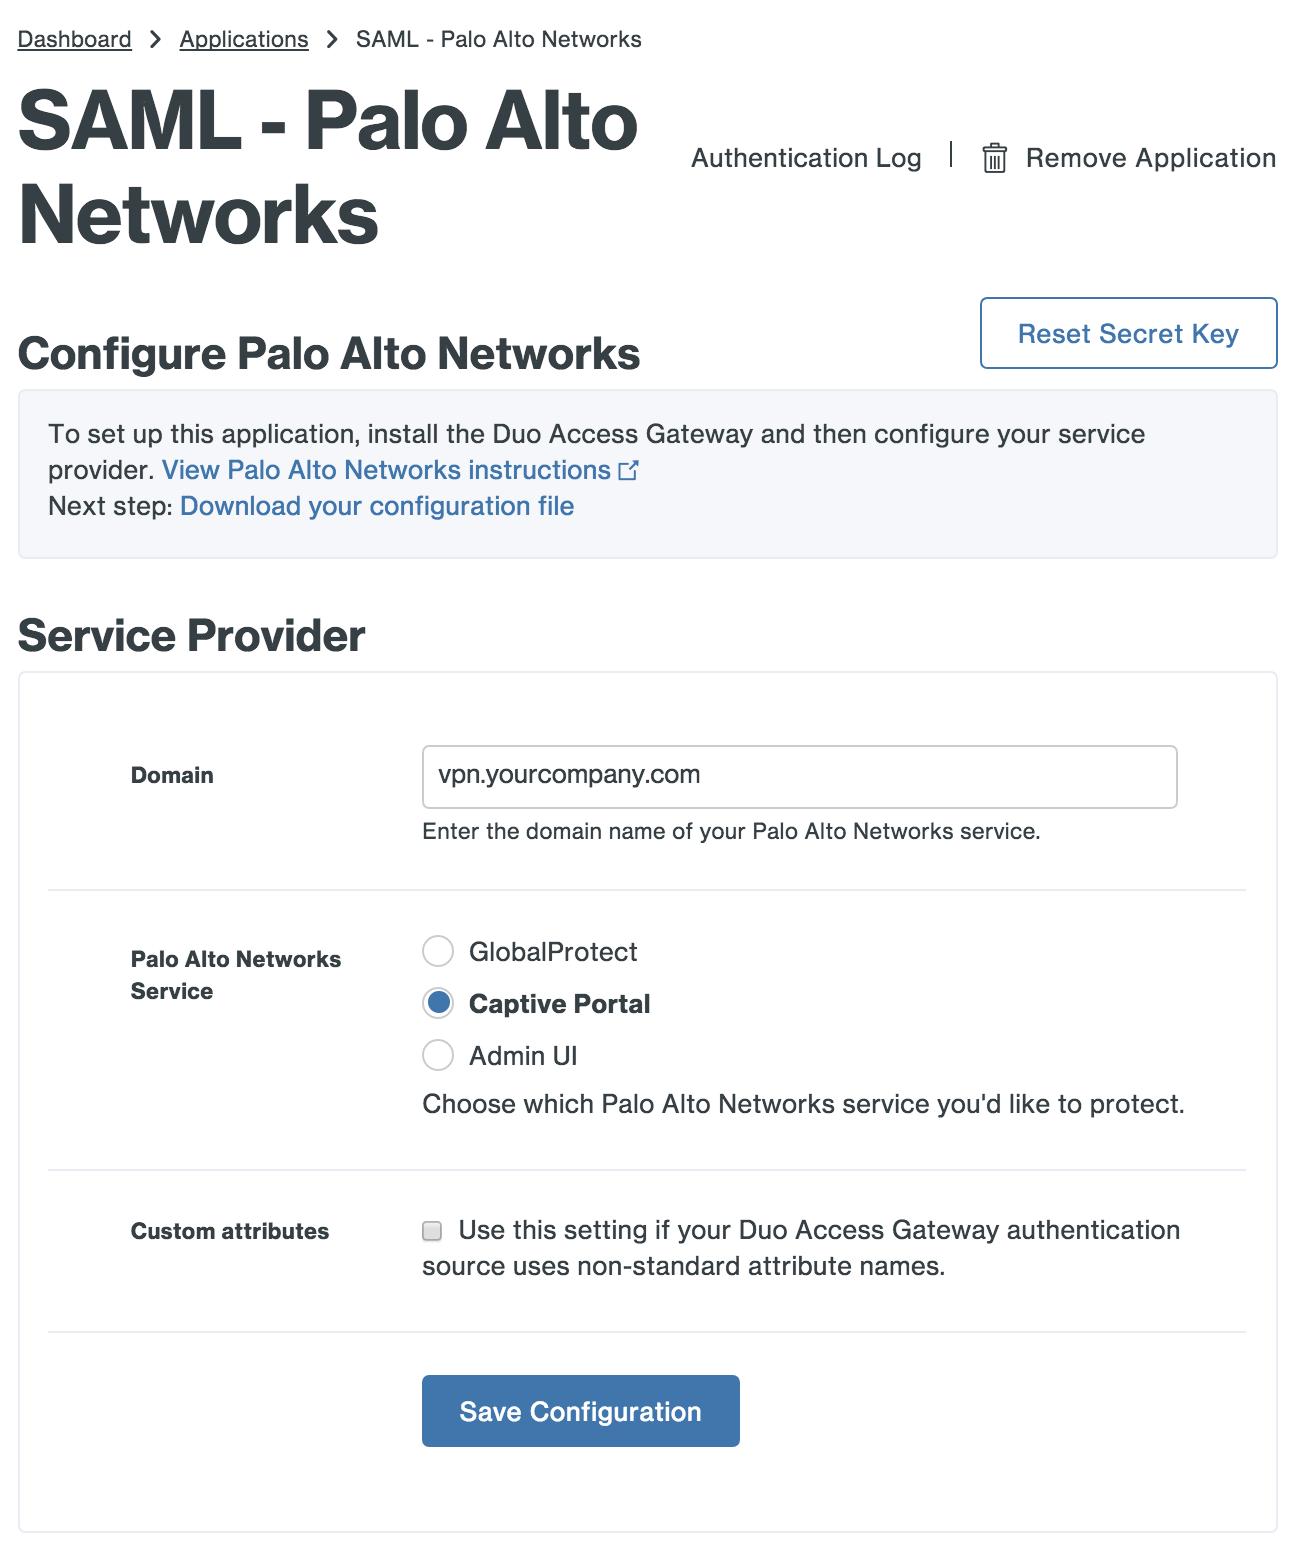 palo alto networks documentation